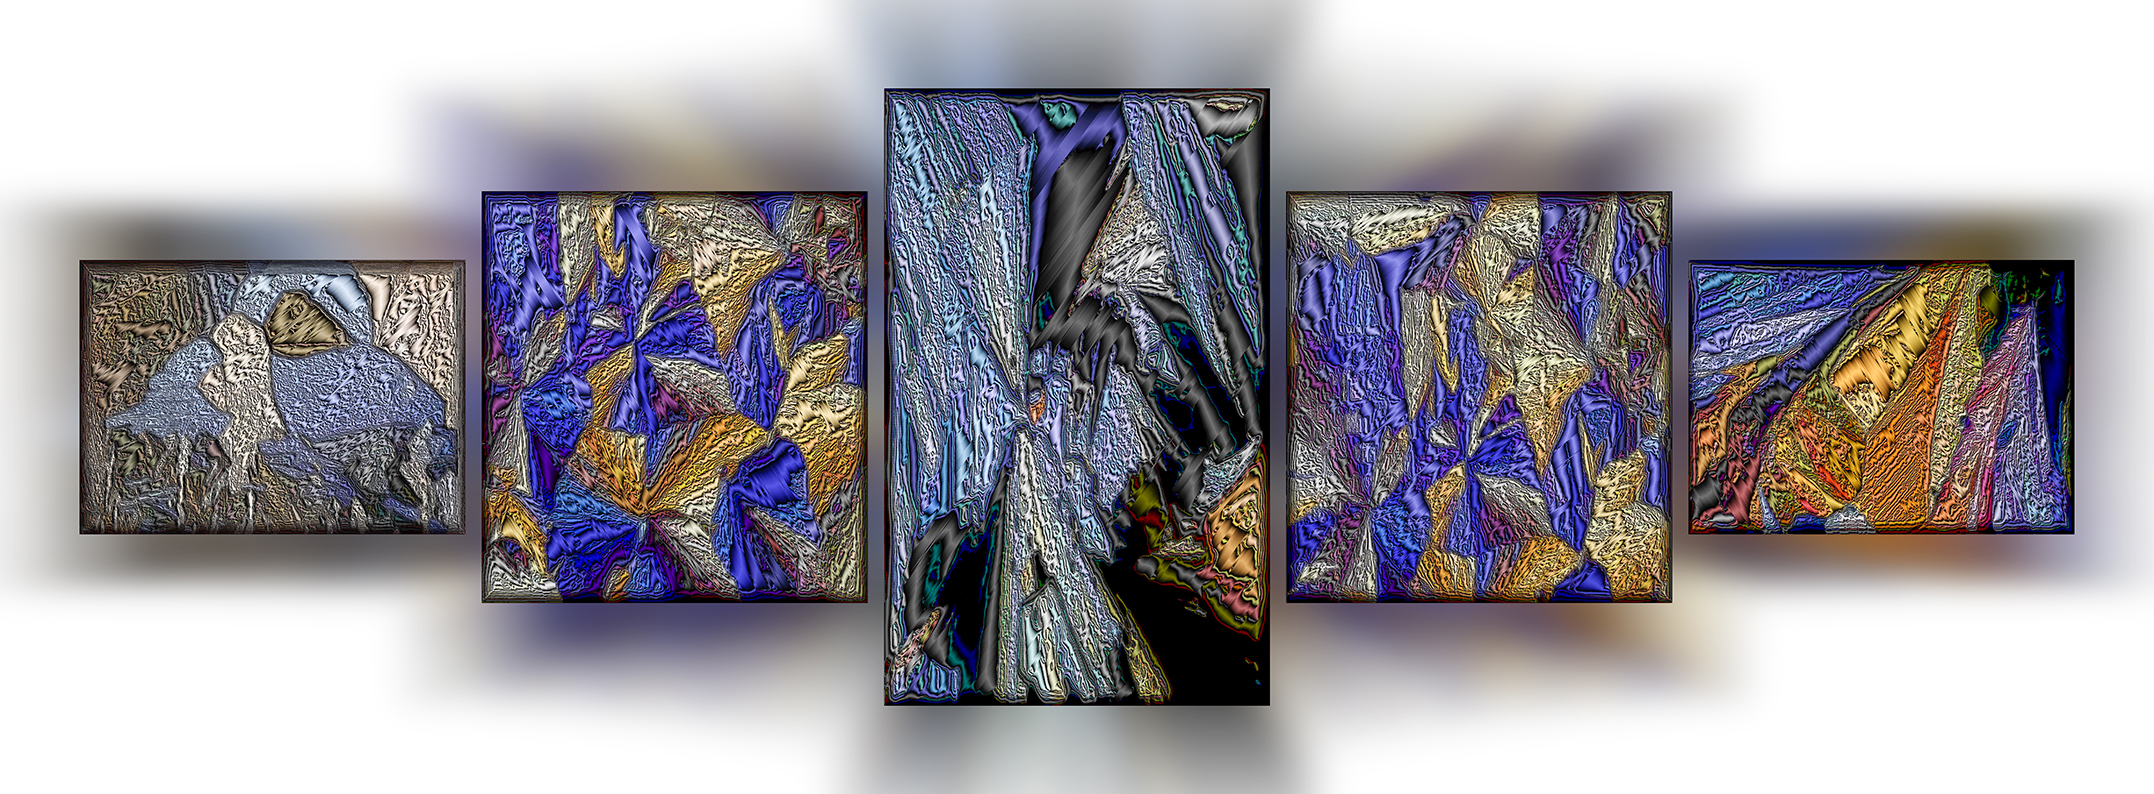 Triptychon 015